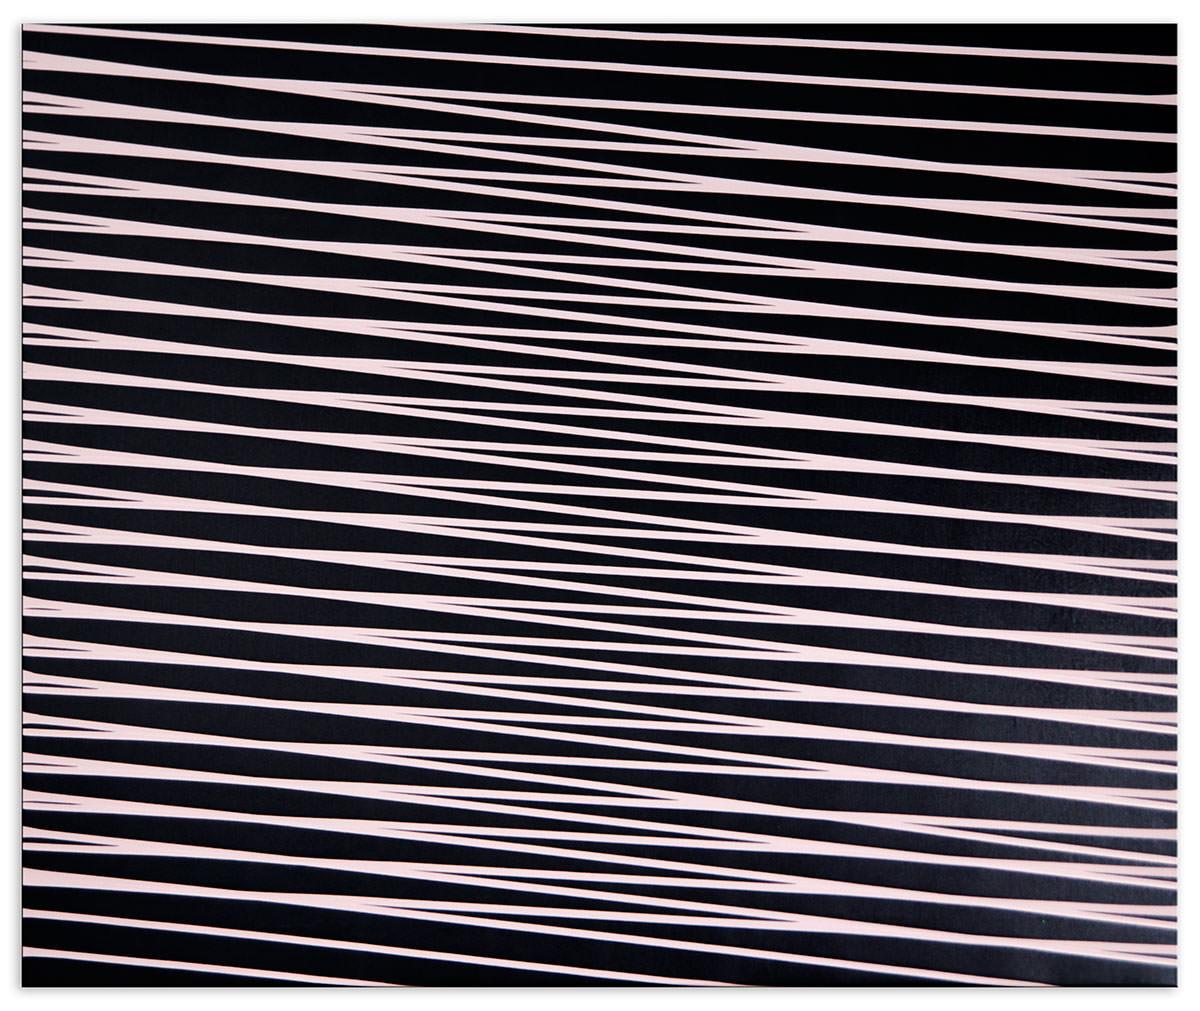 Wave PAth 1, 2017 Acryllack auf Lederimitat, 100 x 120 cm